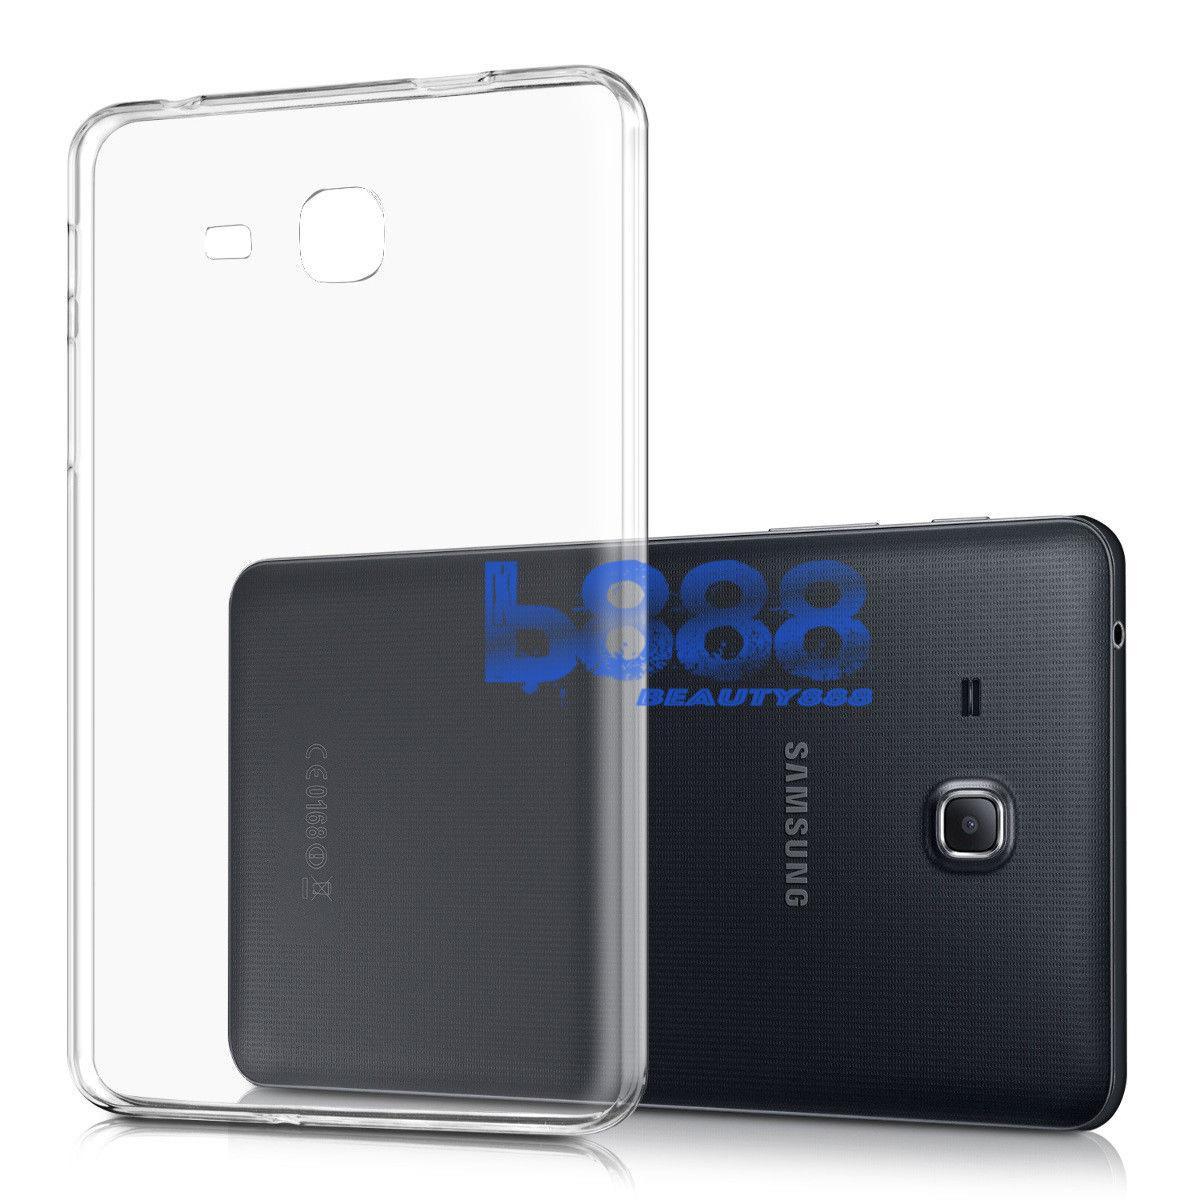 Beauty Case Samsung Galaxy Tab A 2016 T280 T285 Ukuran 7.0 inch Ultrathin Elegant Softcase Anti Jam